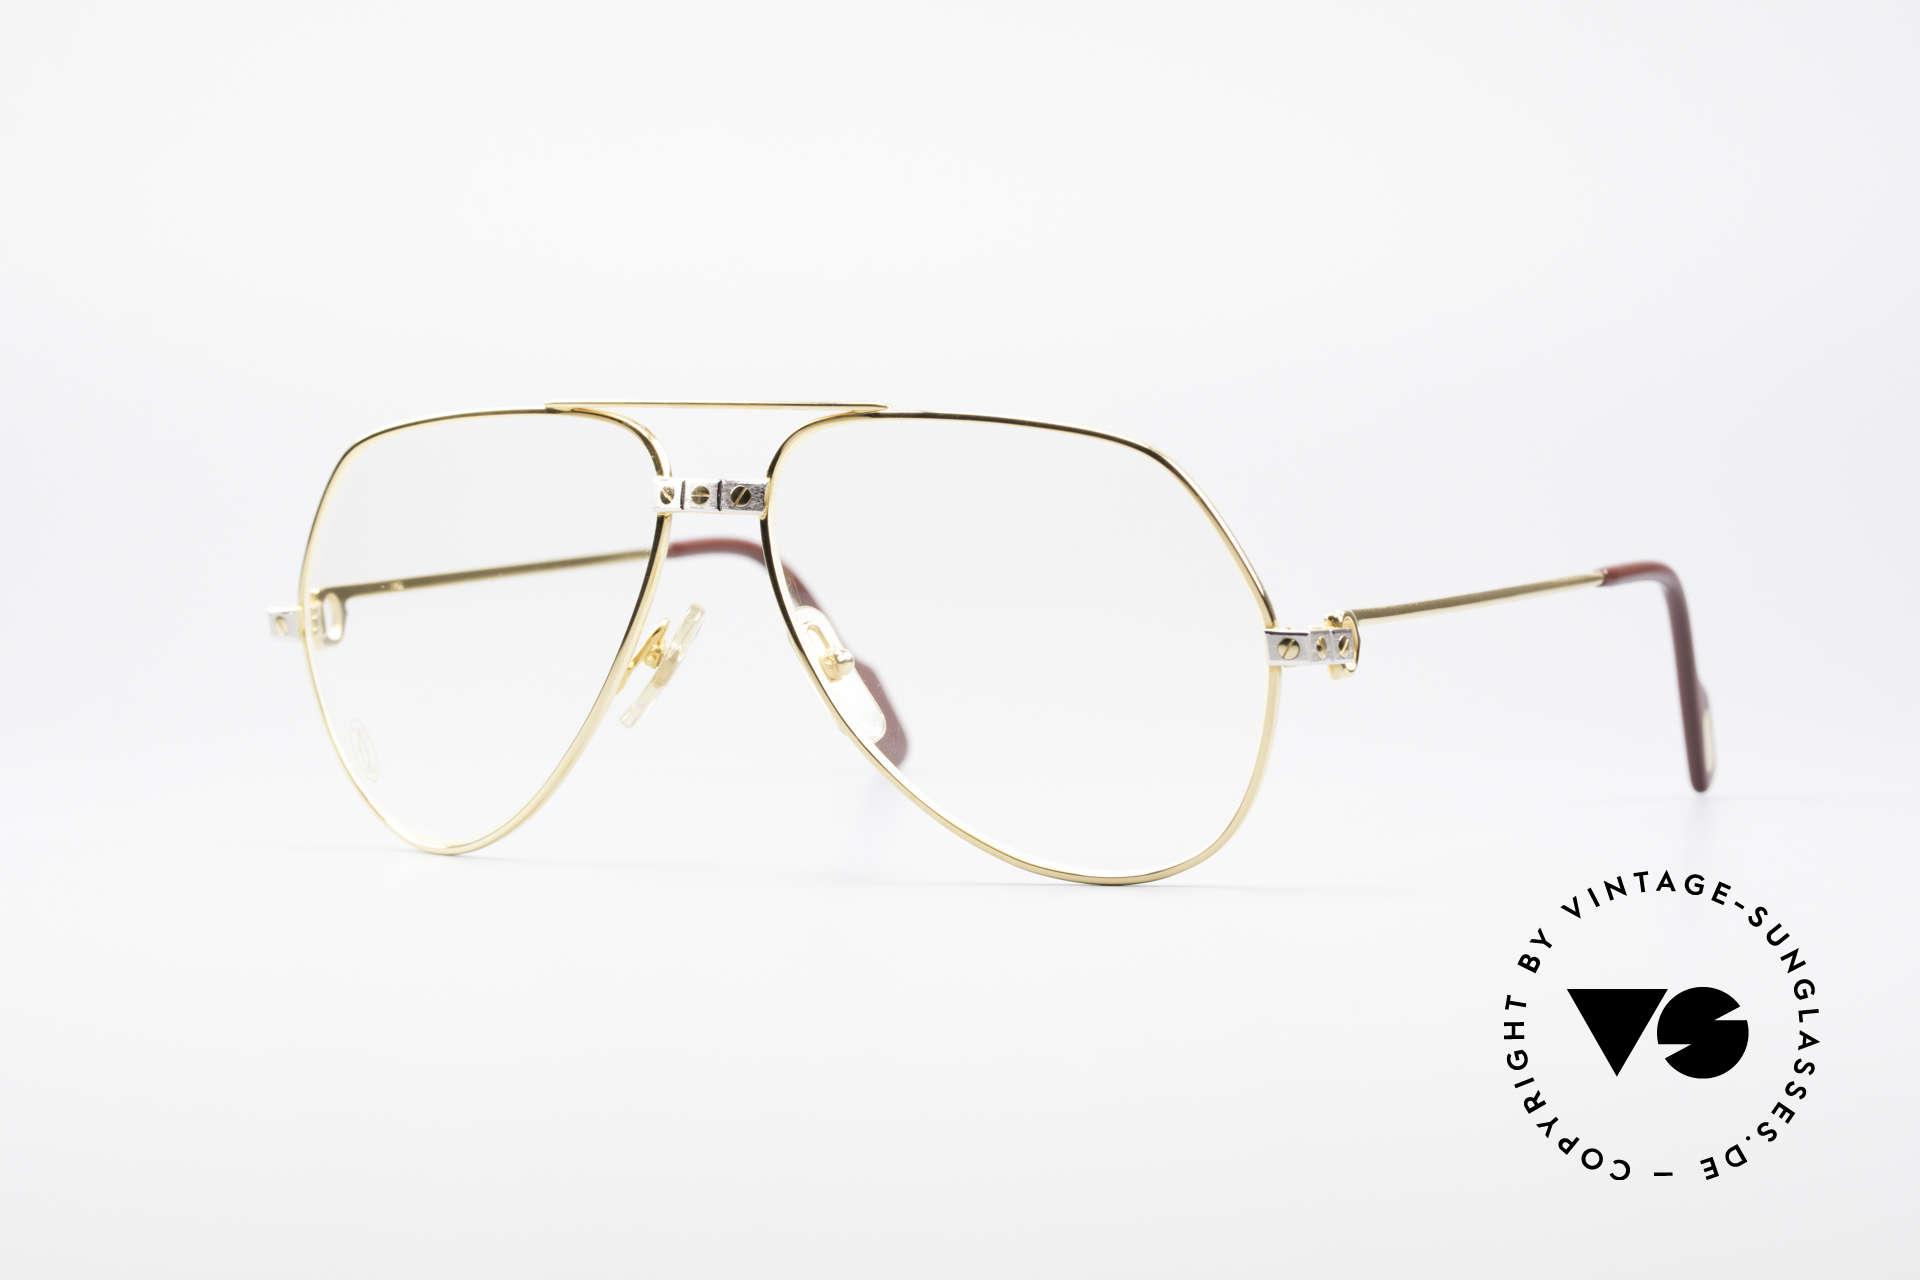 Cartier Vendome Santos - M James Bond Glasses Original, Vendome = the most famous eyewear design by CARTIER, Made for Men